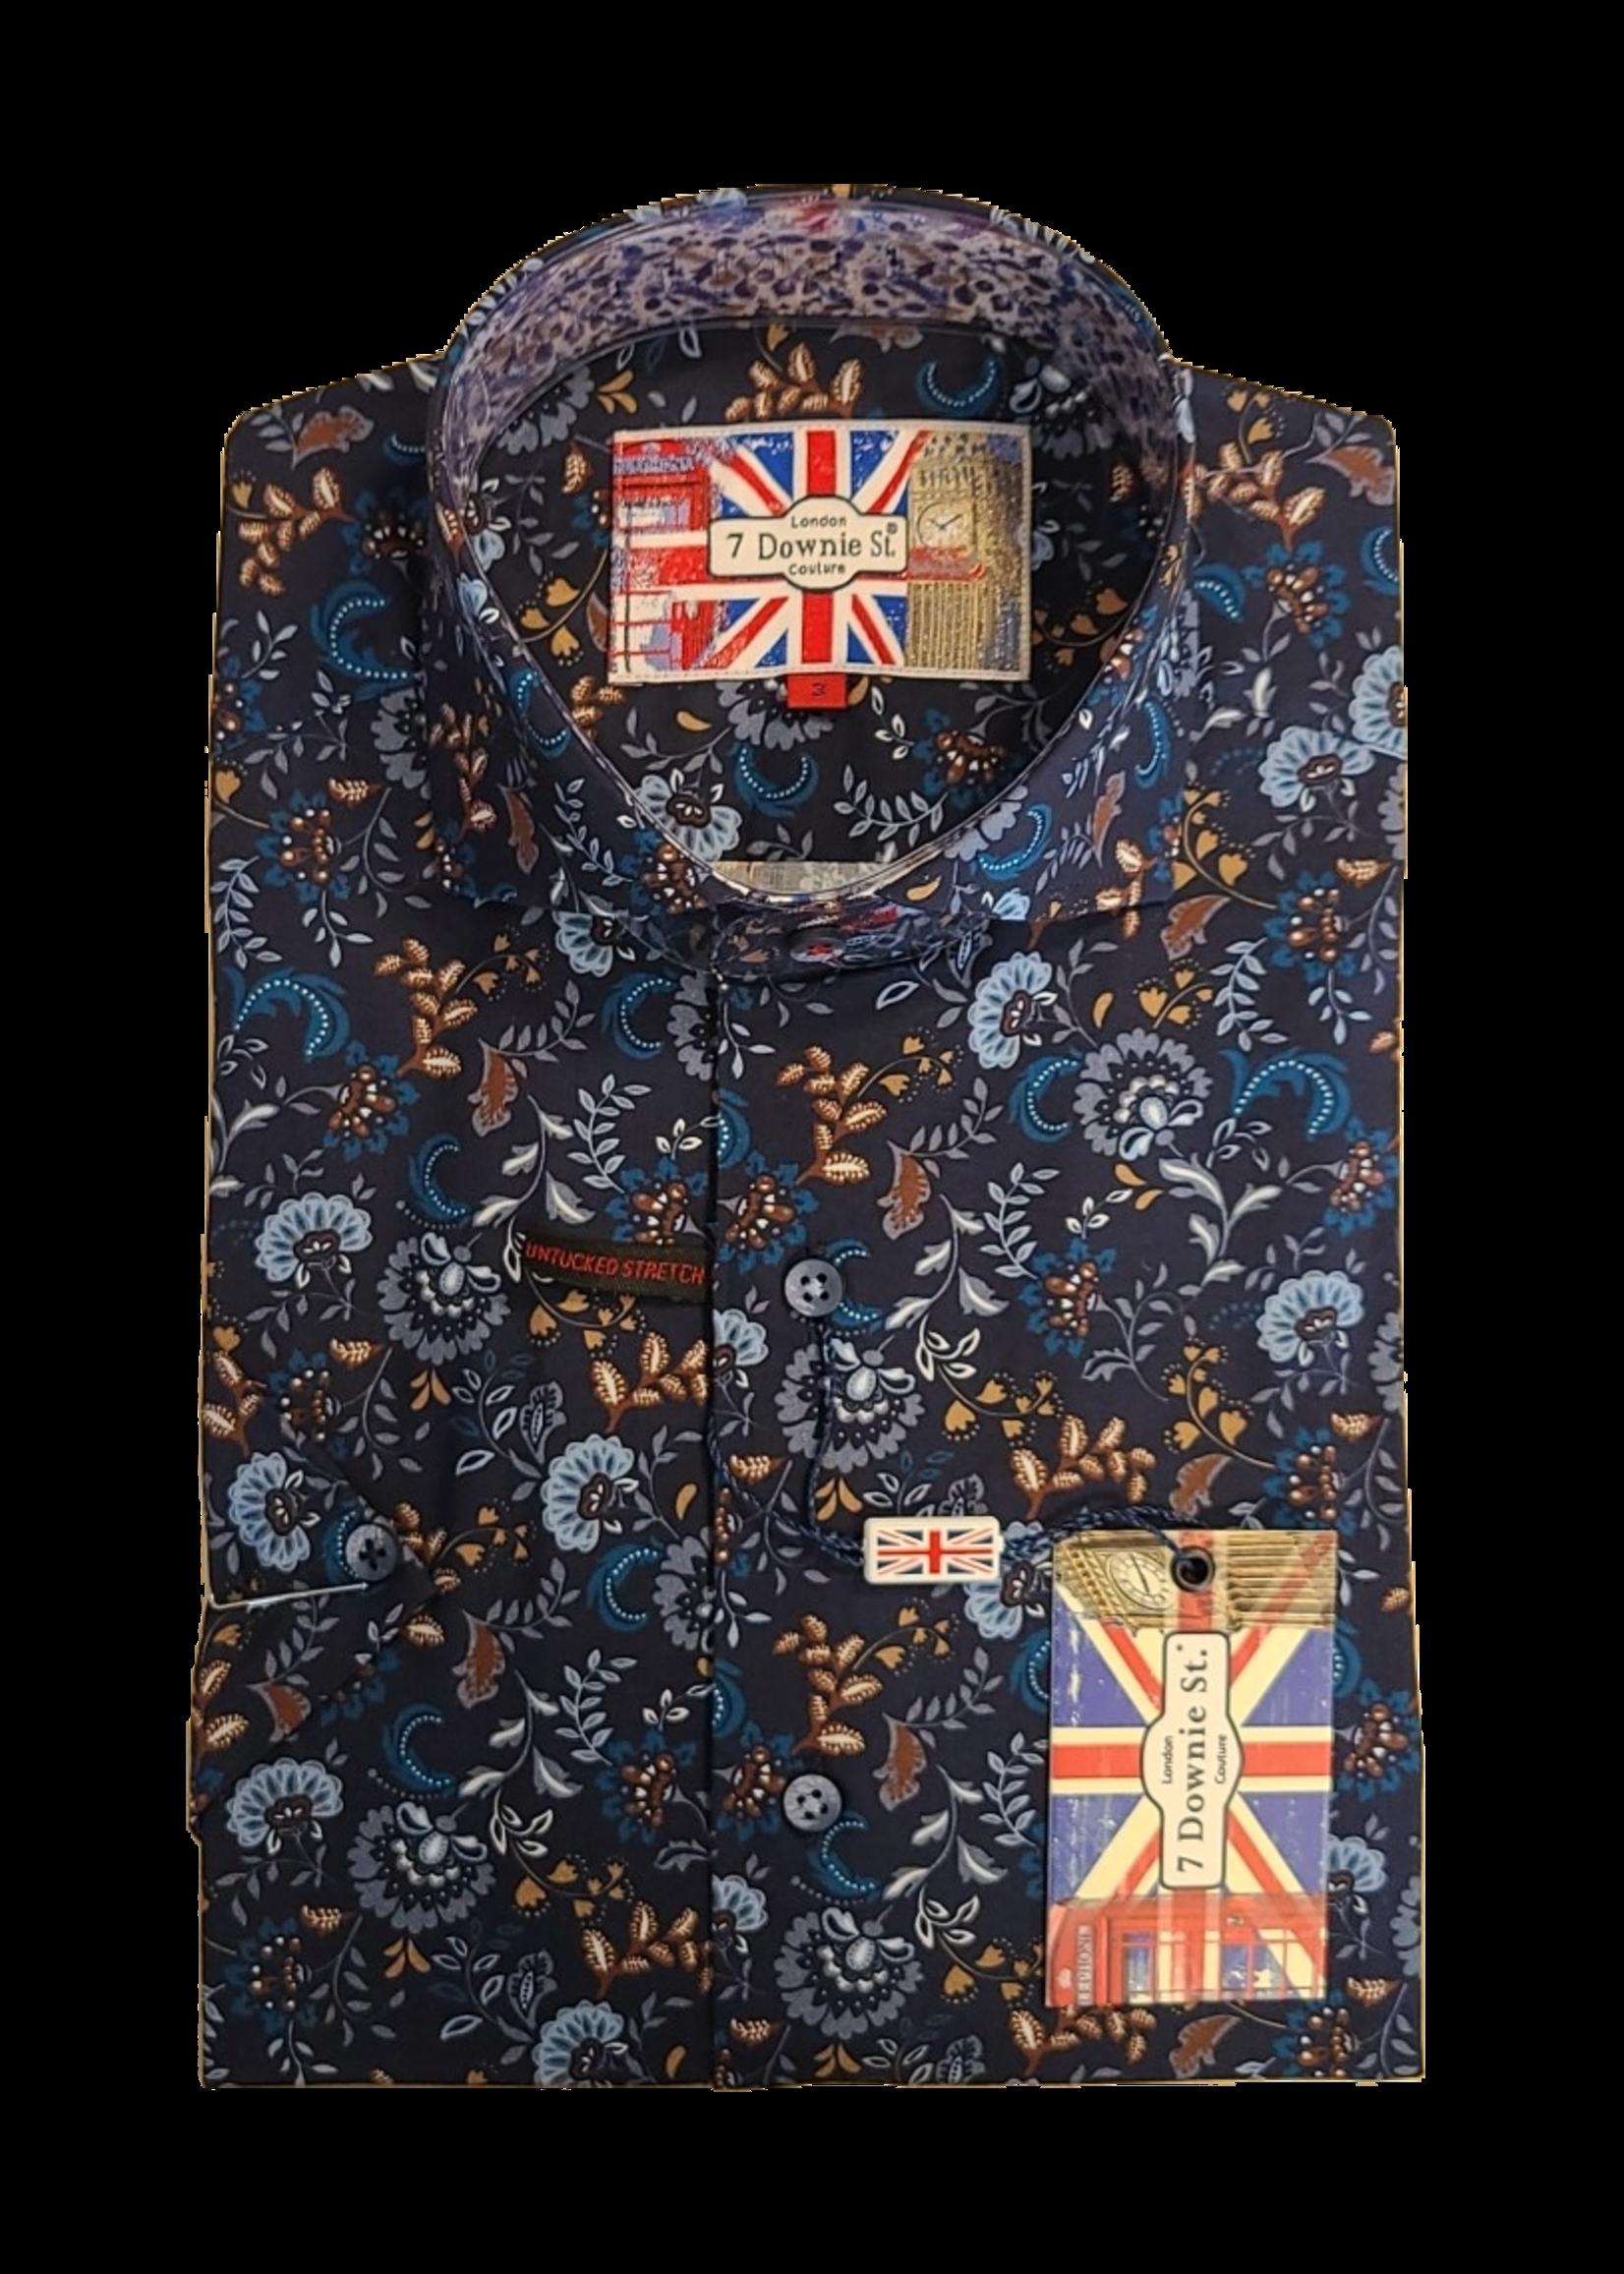 7 Downie St. 7 Downie St. Short Sleeve Shirt 7017